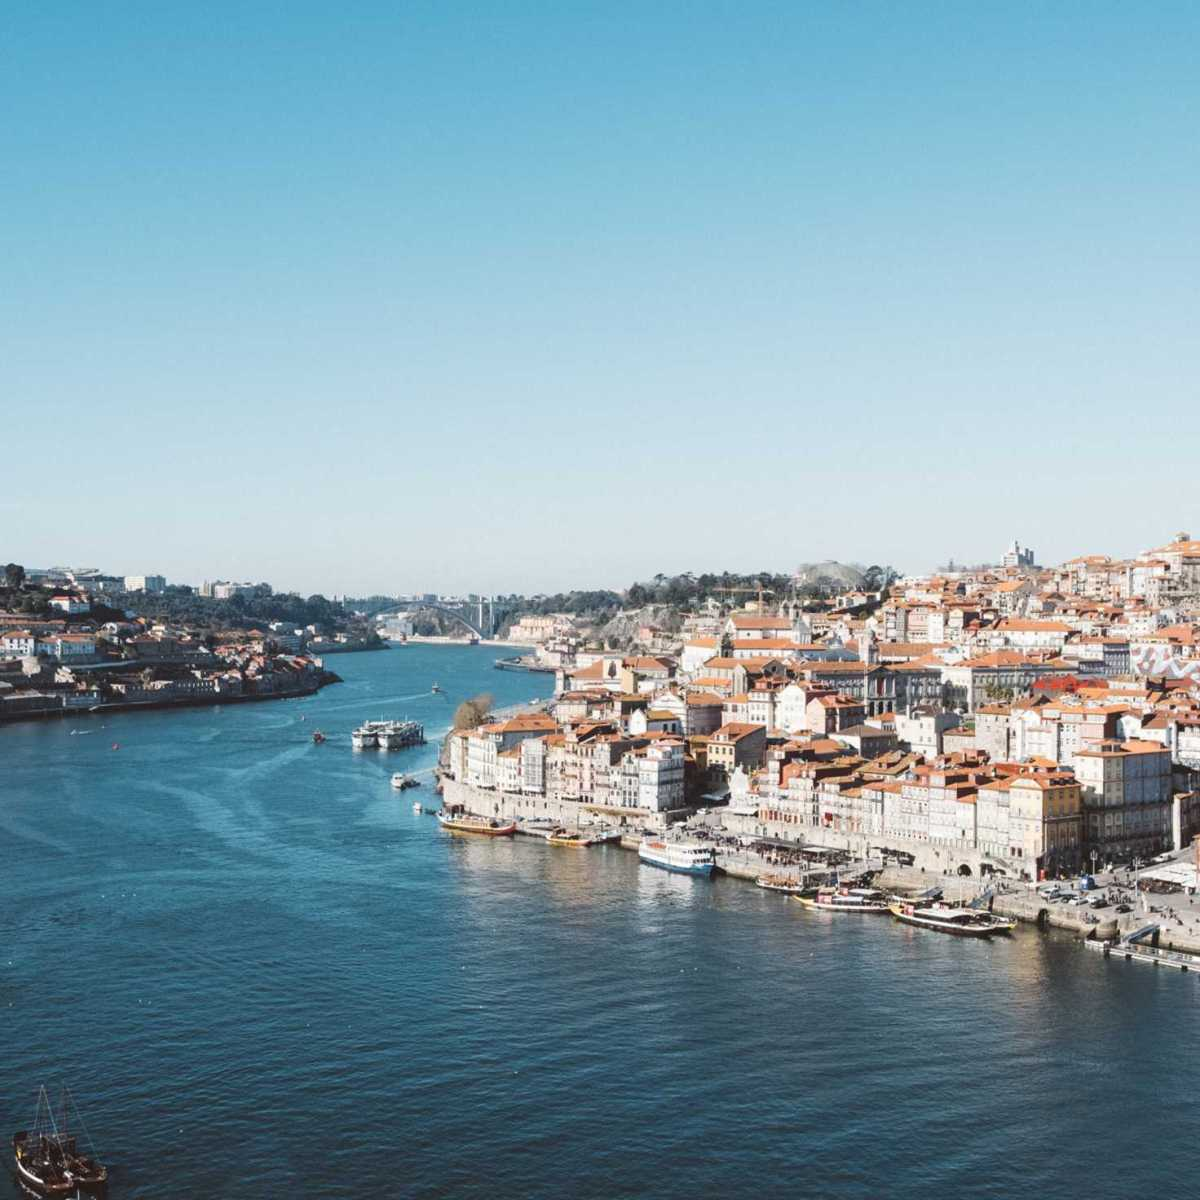 Mete da Scoprire: Week End a Porto